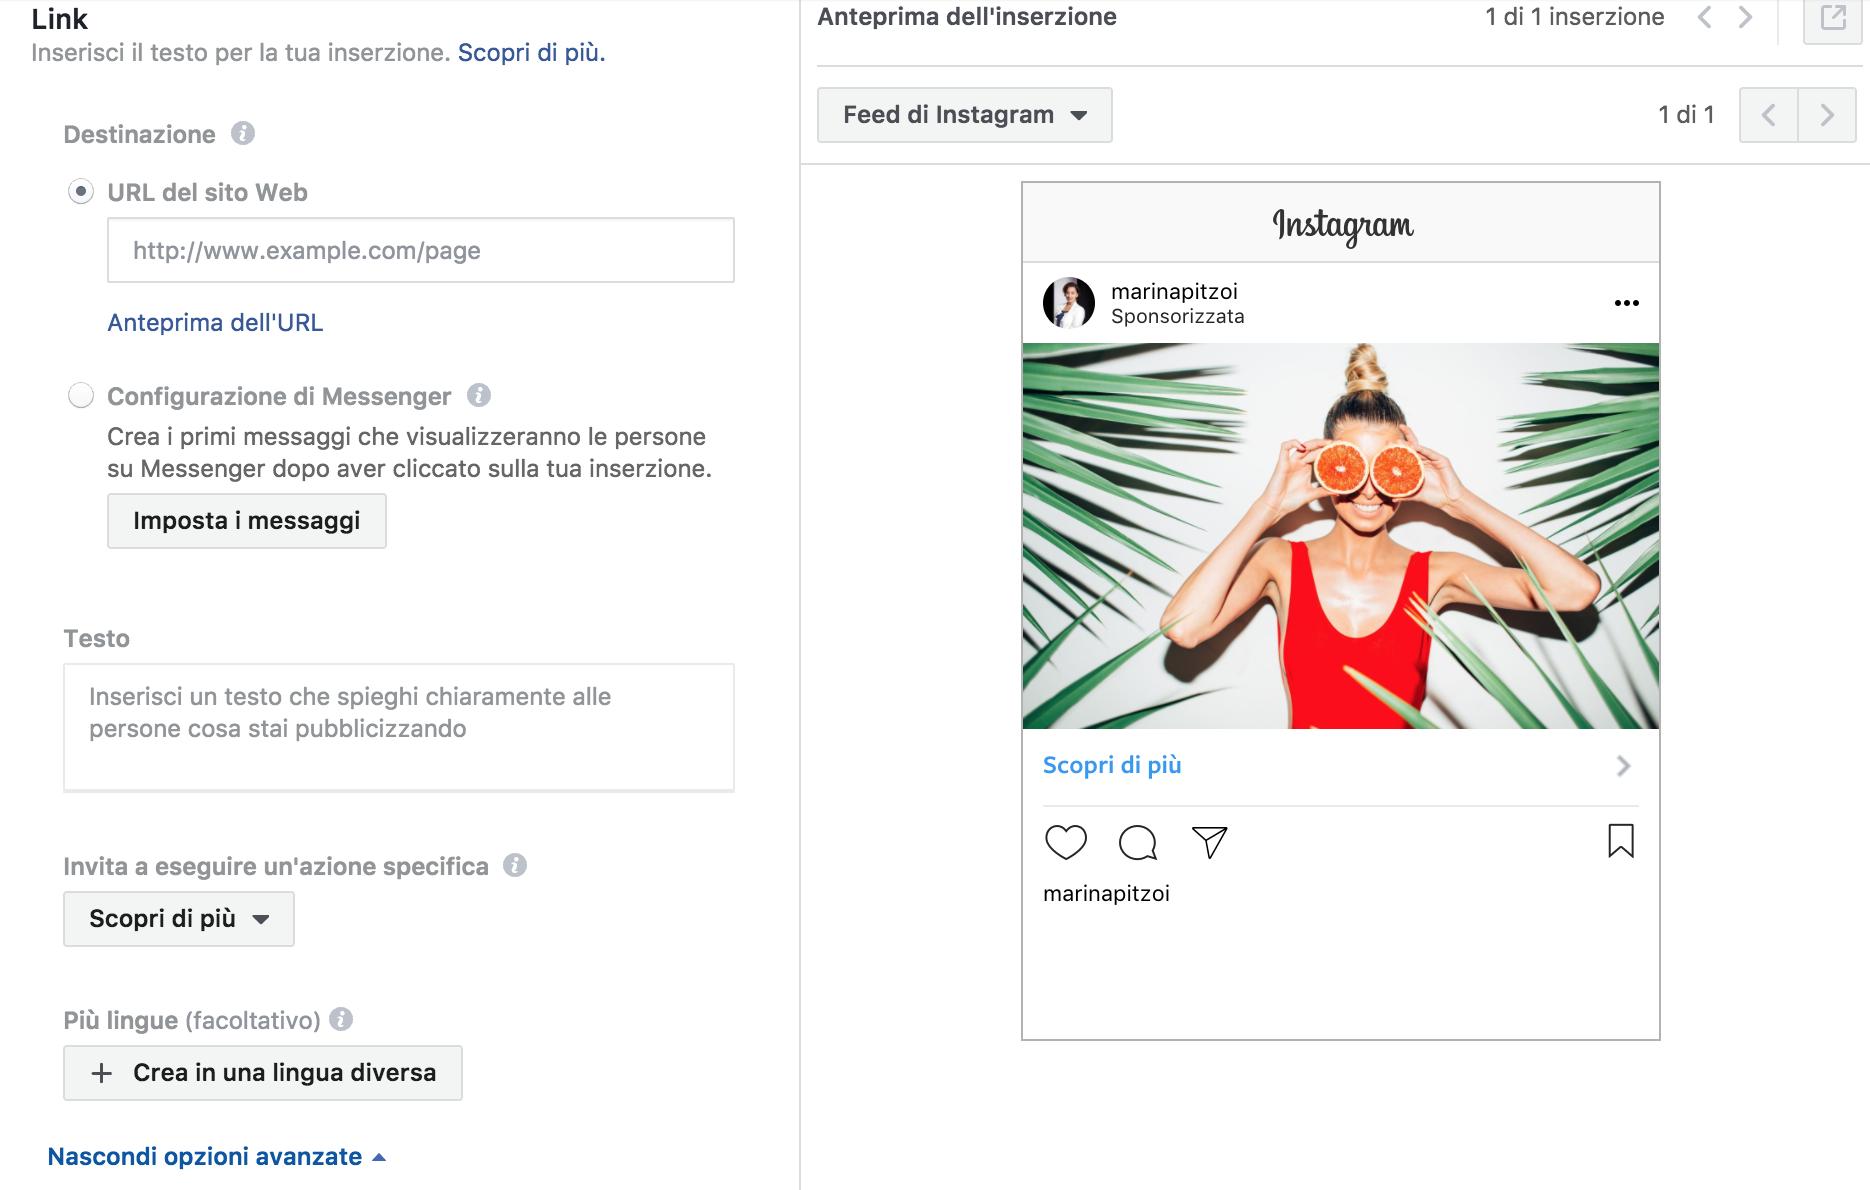 Anteprima dell'inserzione Instagram da Facebook Manager